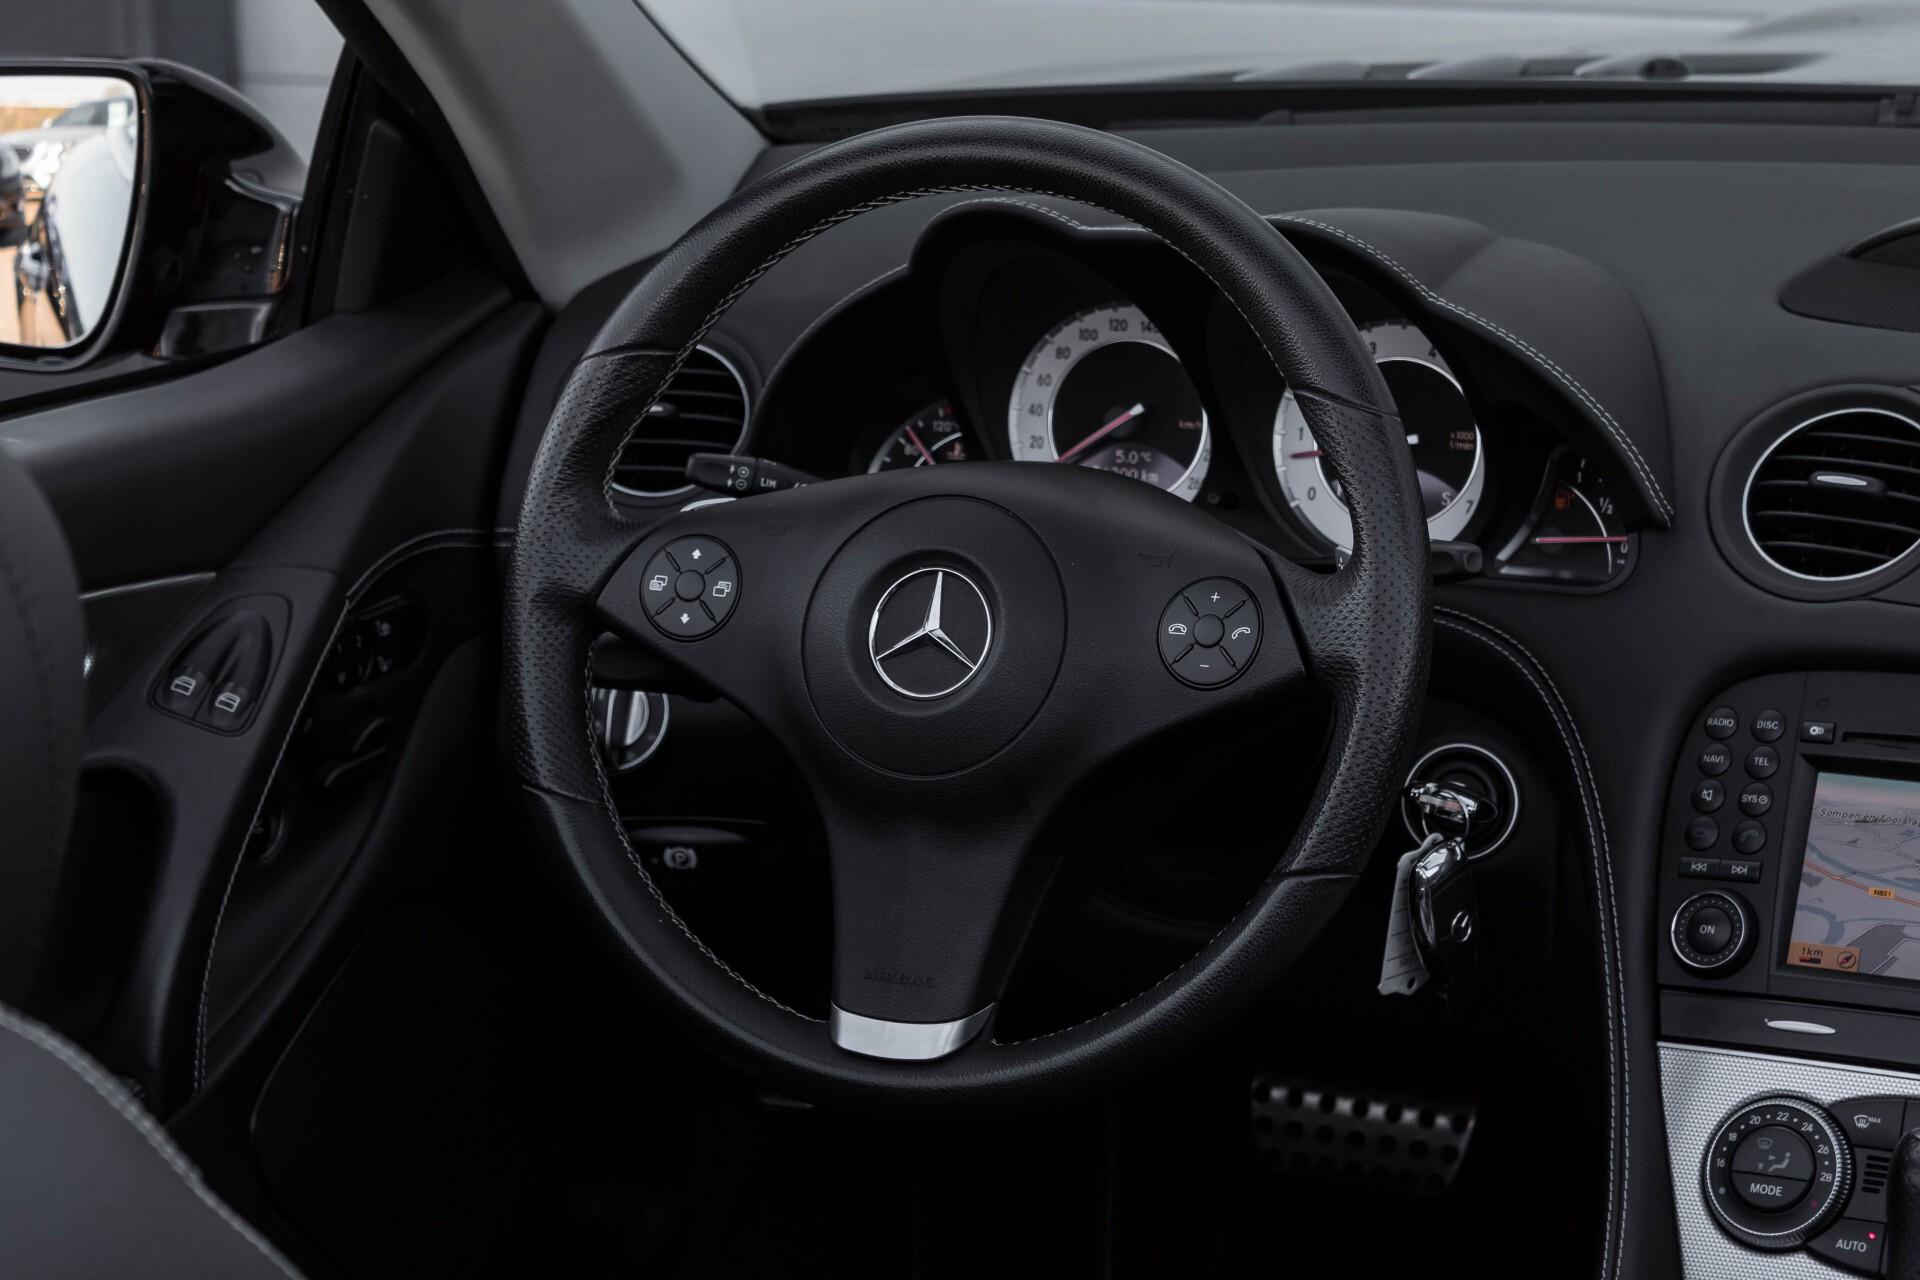 Mercedes-Benz SL-Klasse 500 Sport ABC/Harman-Kardon/Comand/Distronic Aut7 NP €175292 Foto 10